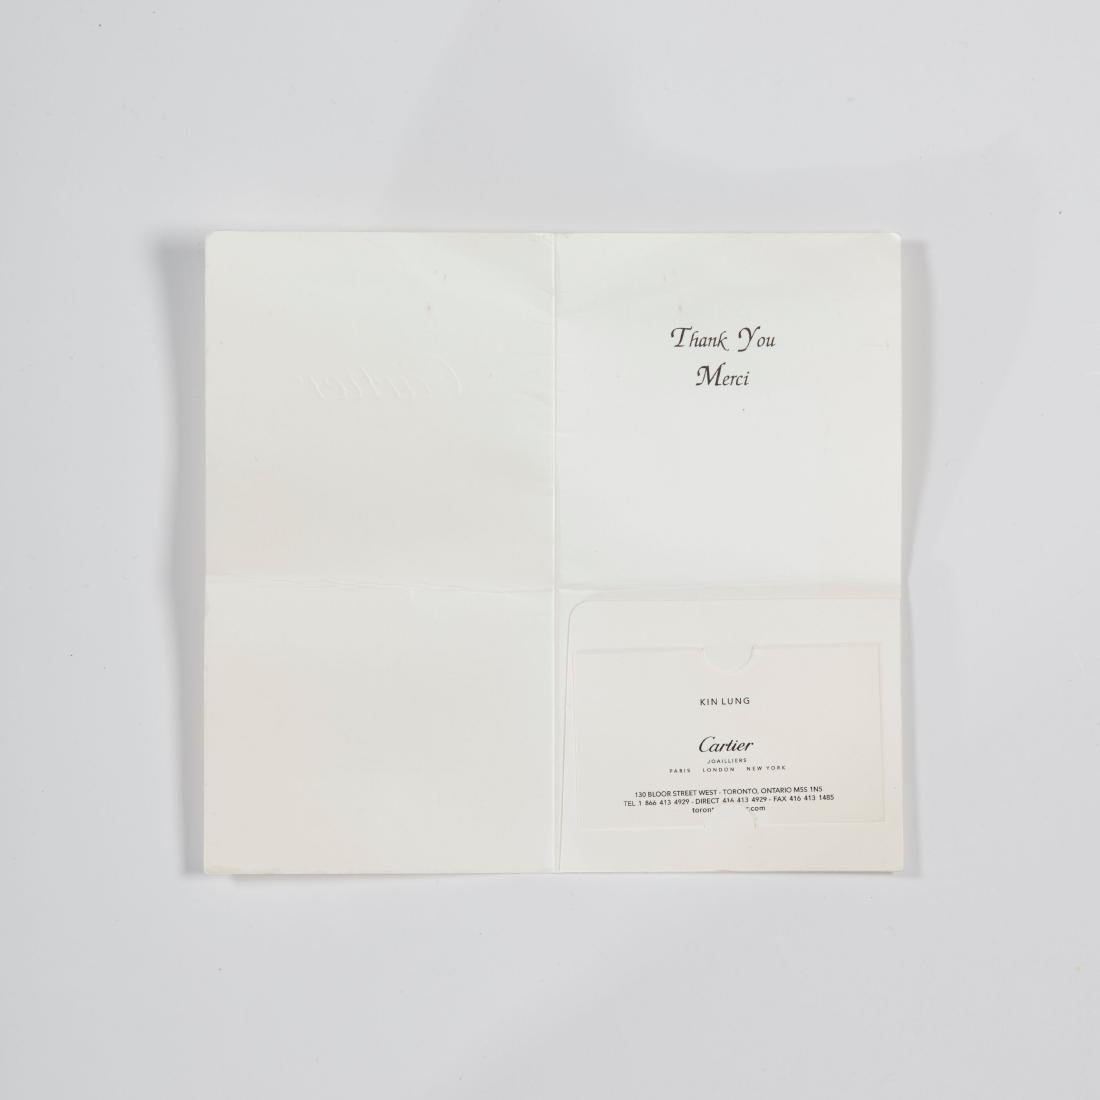 Cartier, Cougar Mid-Size Wristwatch - 5